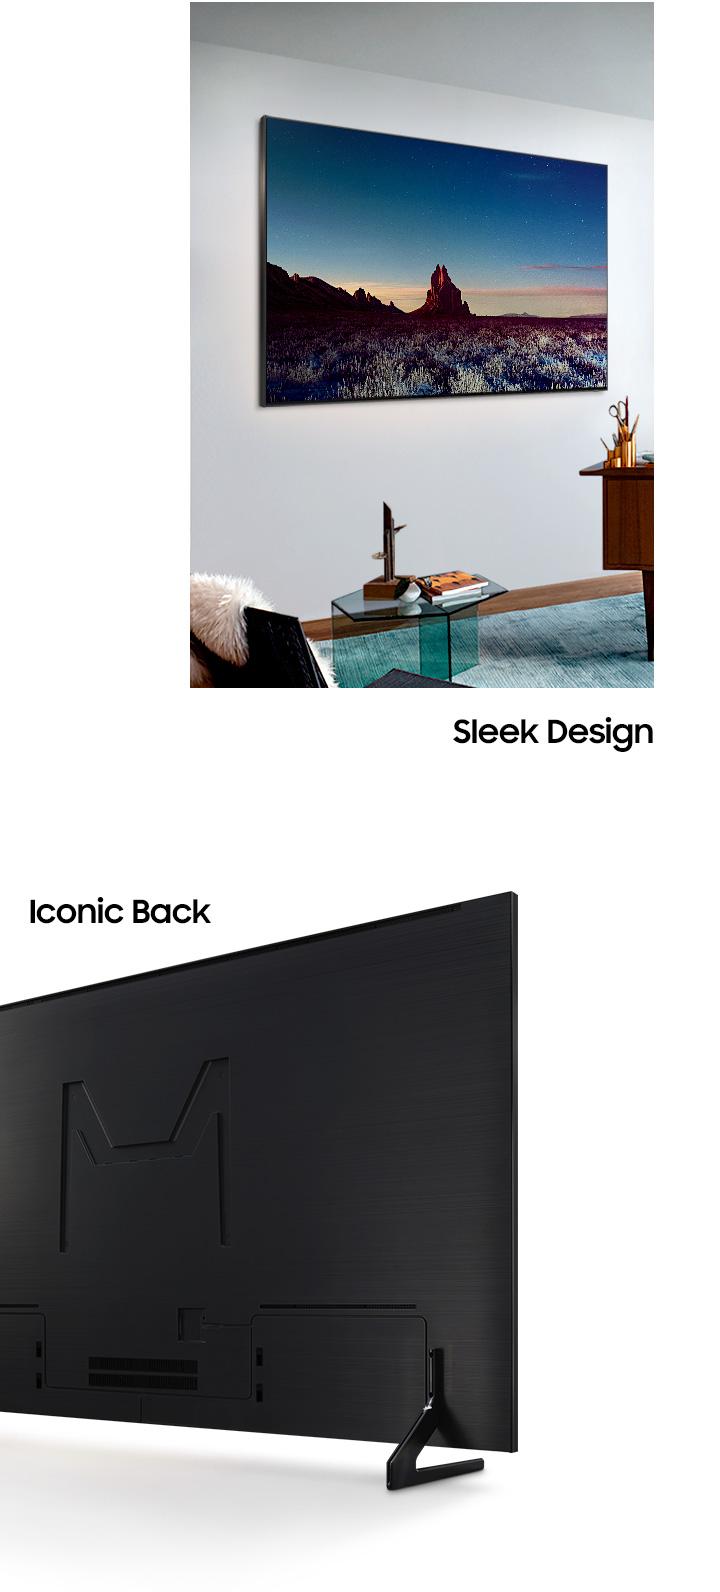 Designed with craftsmanship